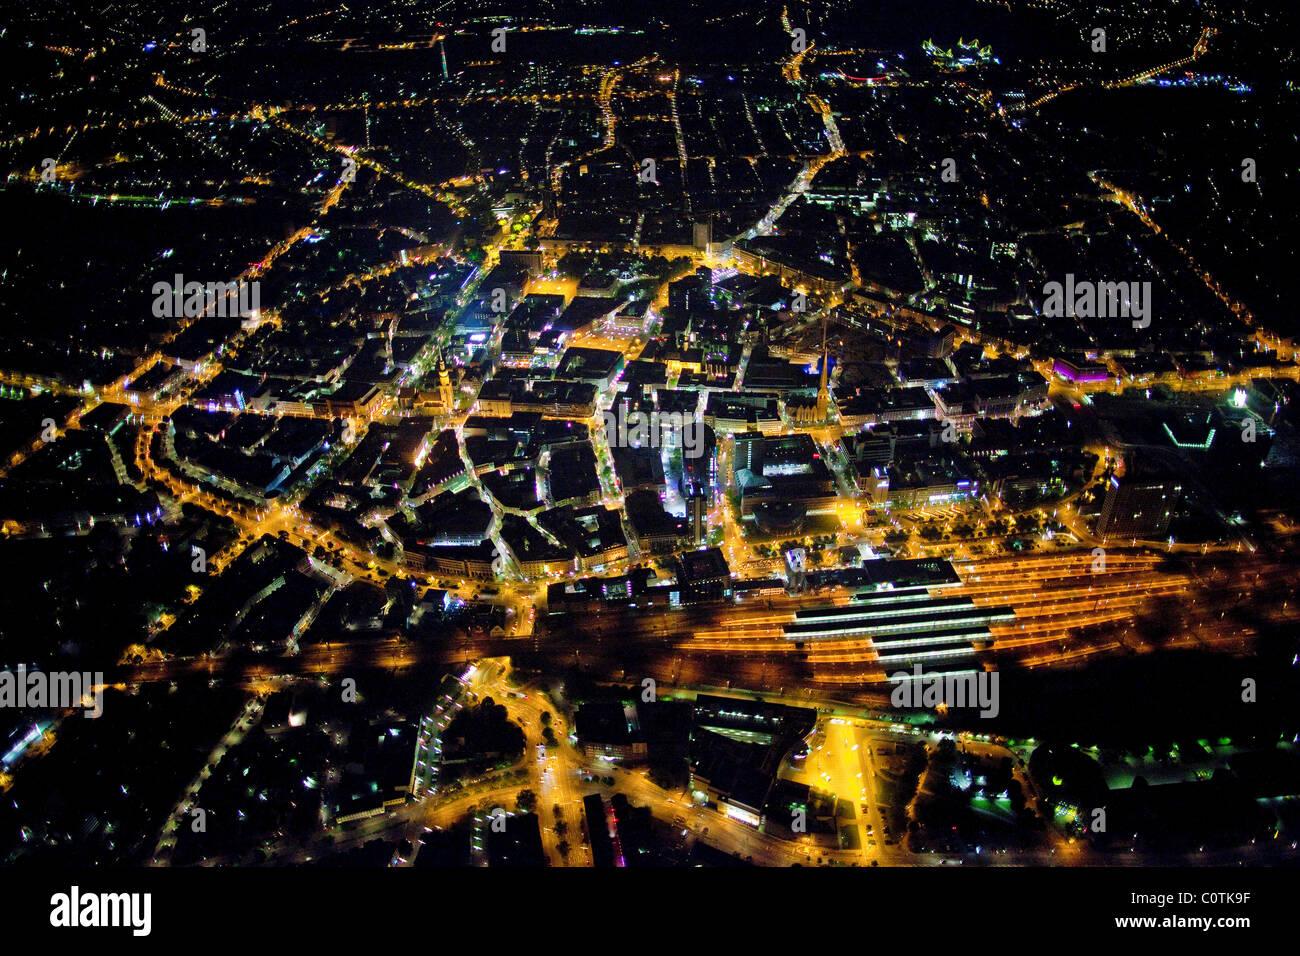 Aerial view, night shot, Dortmund, Ruhrgebiet region, North Rhine-Westphalia, Germany, Europe - Stock Image